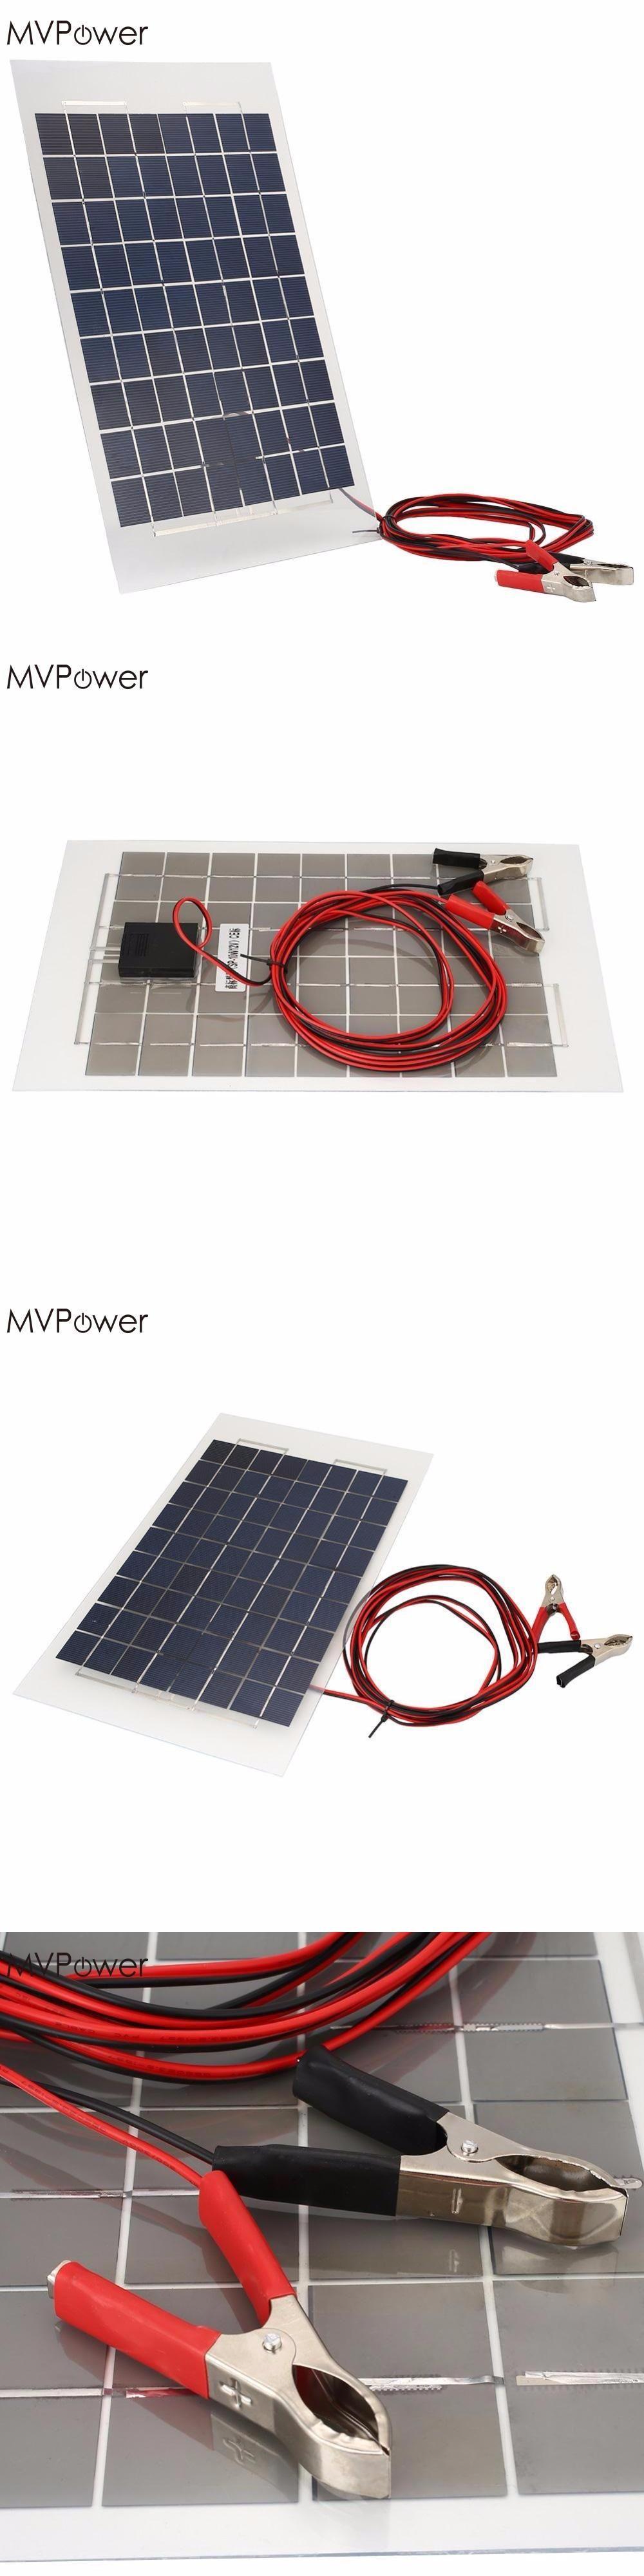 mvpower portable 18v 10w solar panel bank diy solar charger panel